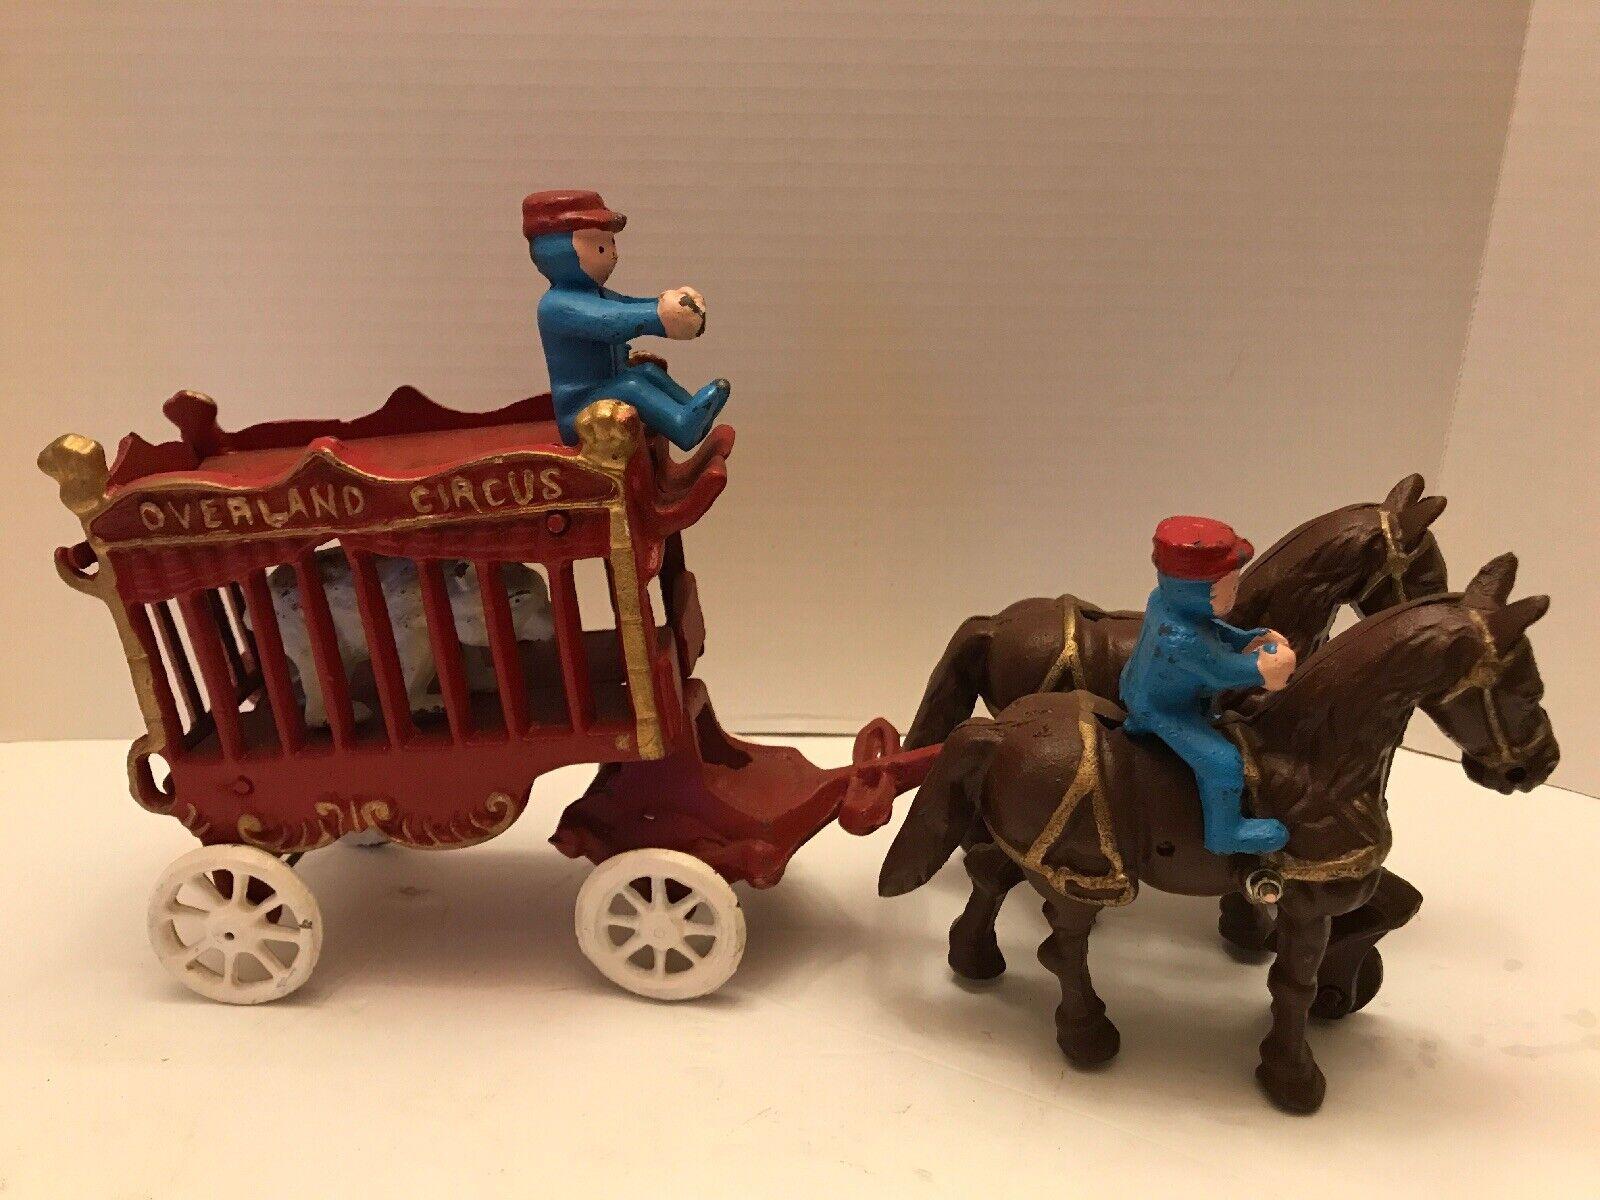 Vintage Cast Iron Overland Circus Wagon w/ Polar Bear & Riders